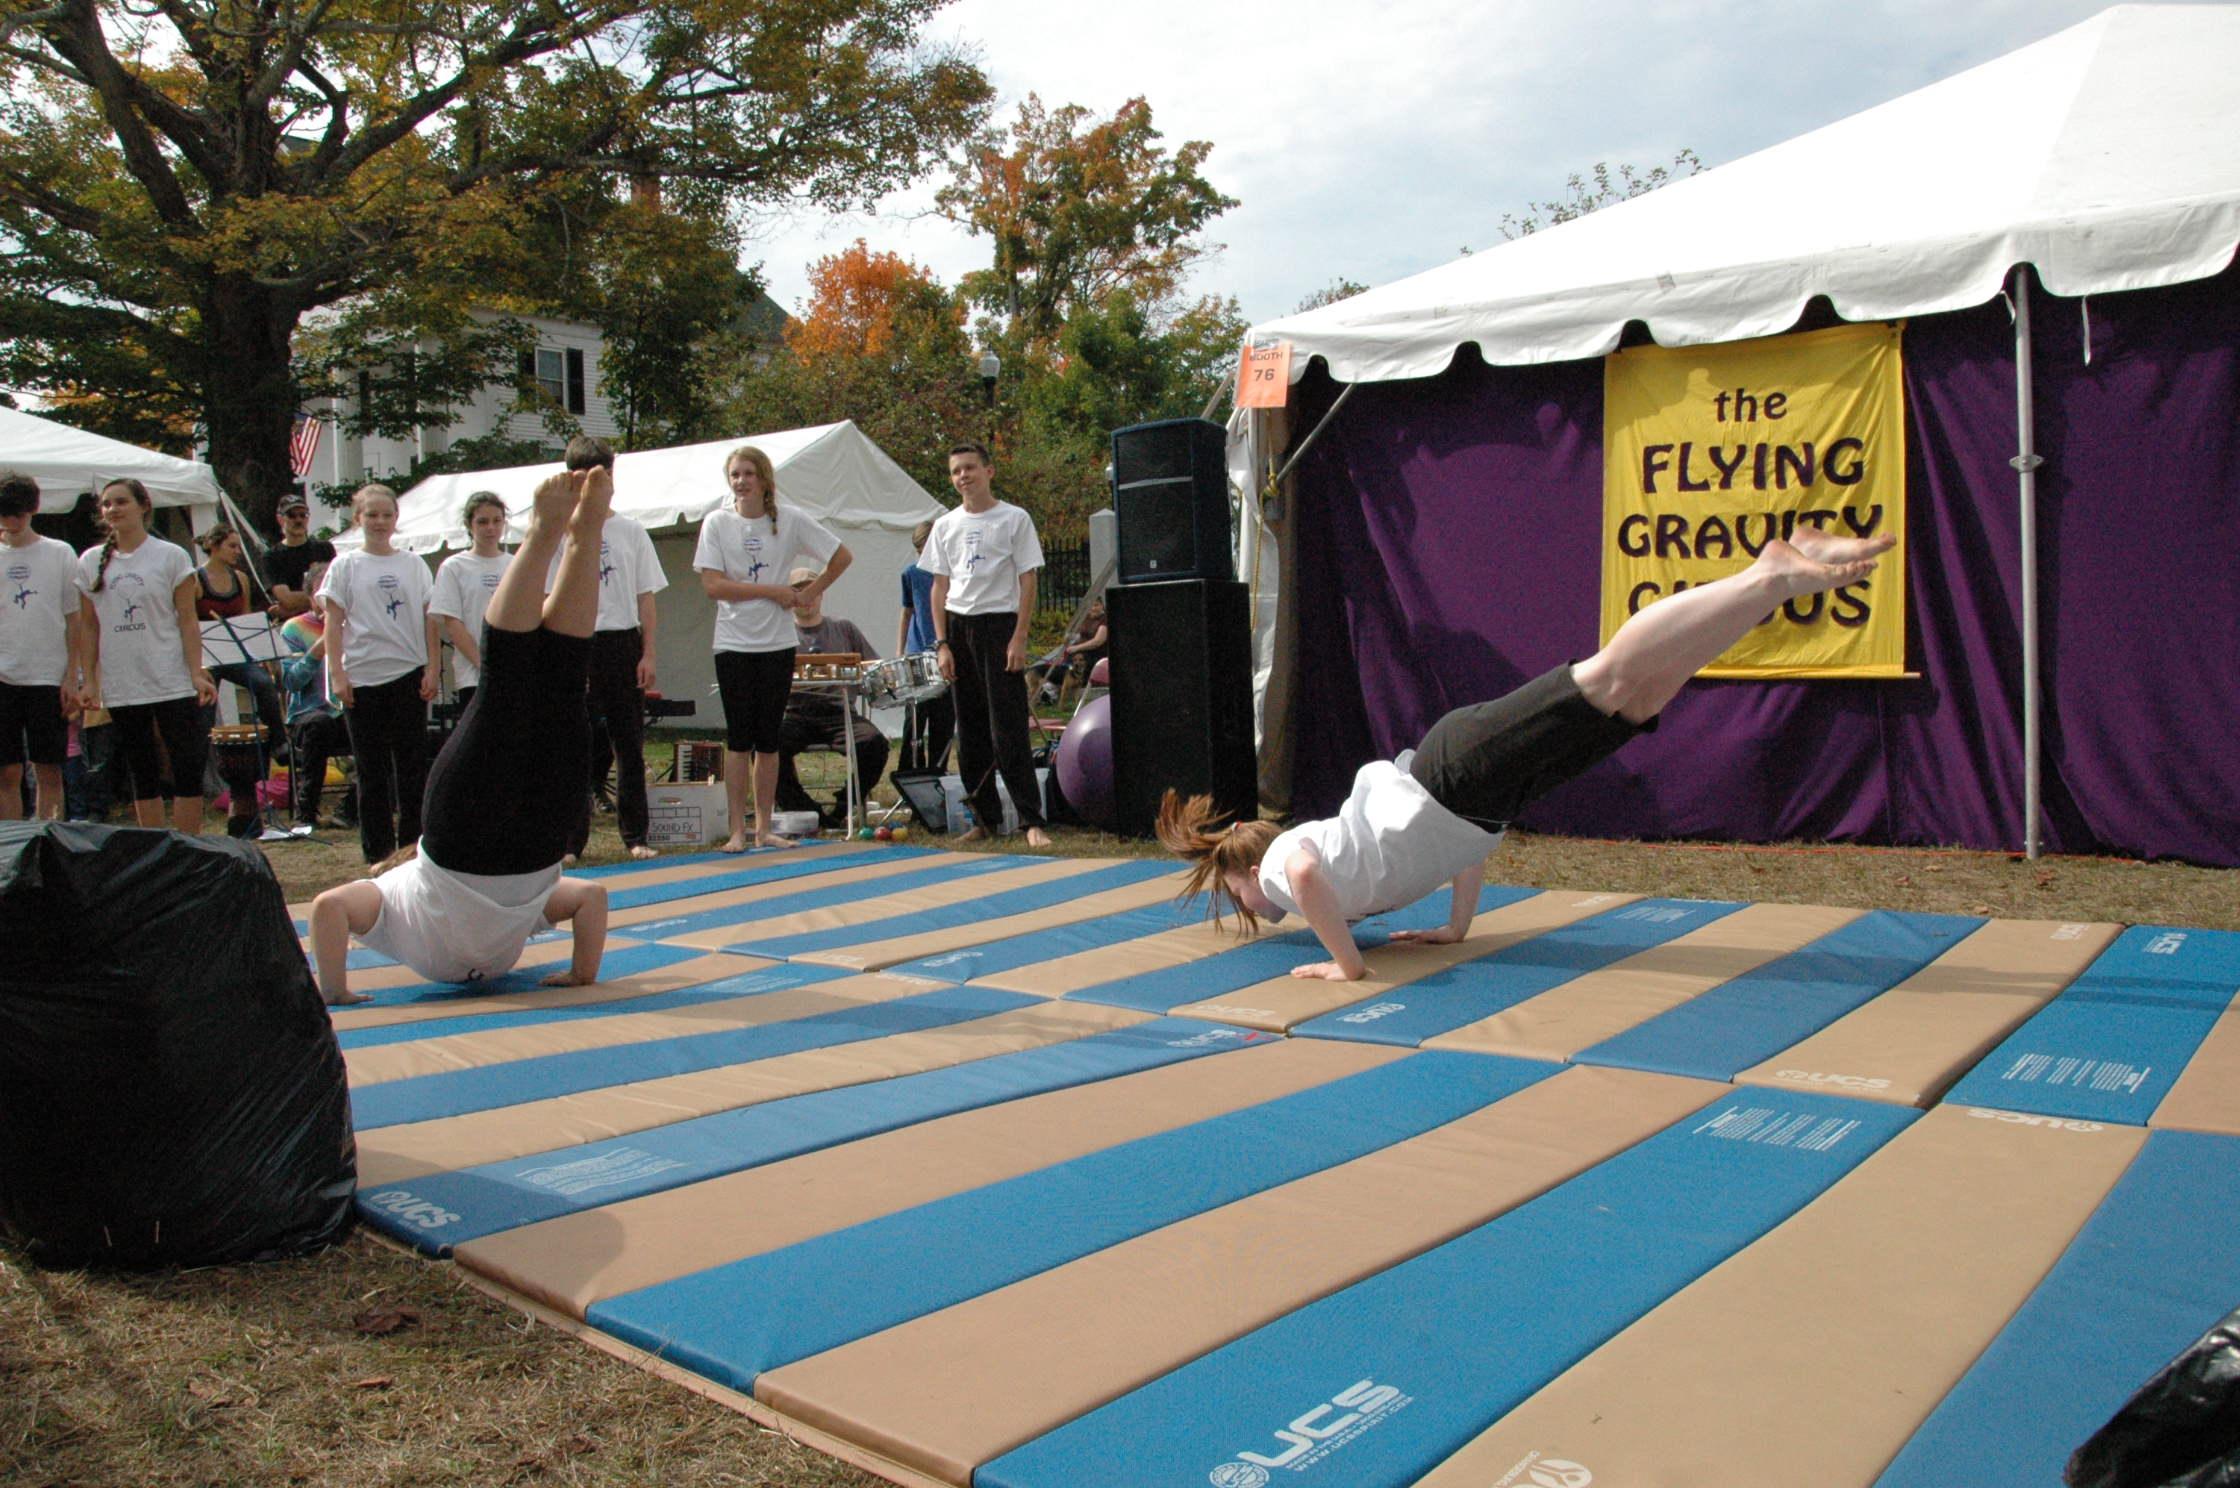 2012-10-06 Flyin Gravity Circus - Pumpkin 048.JPG